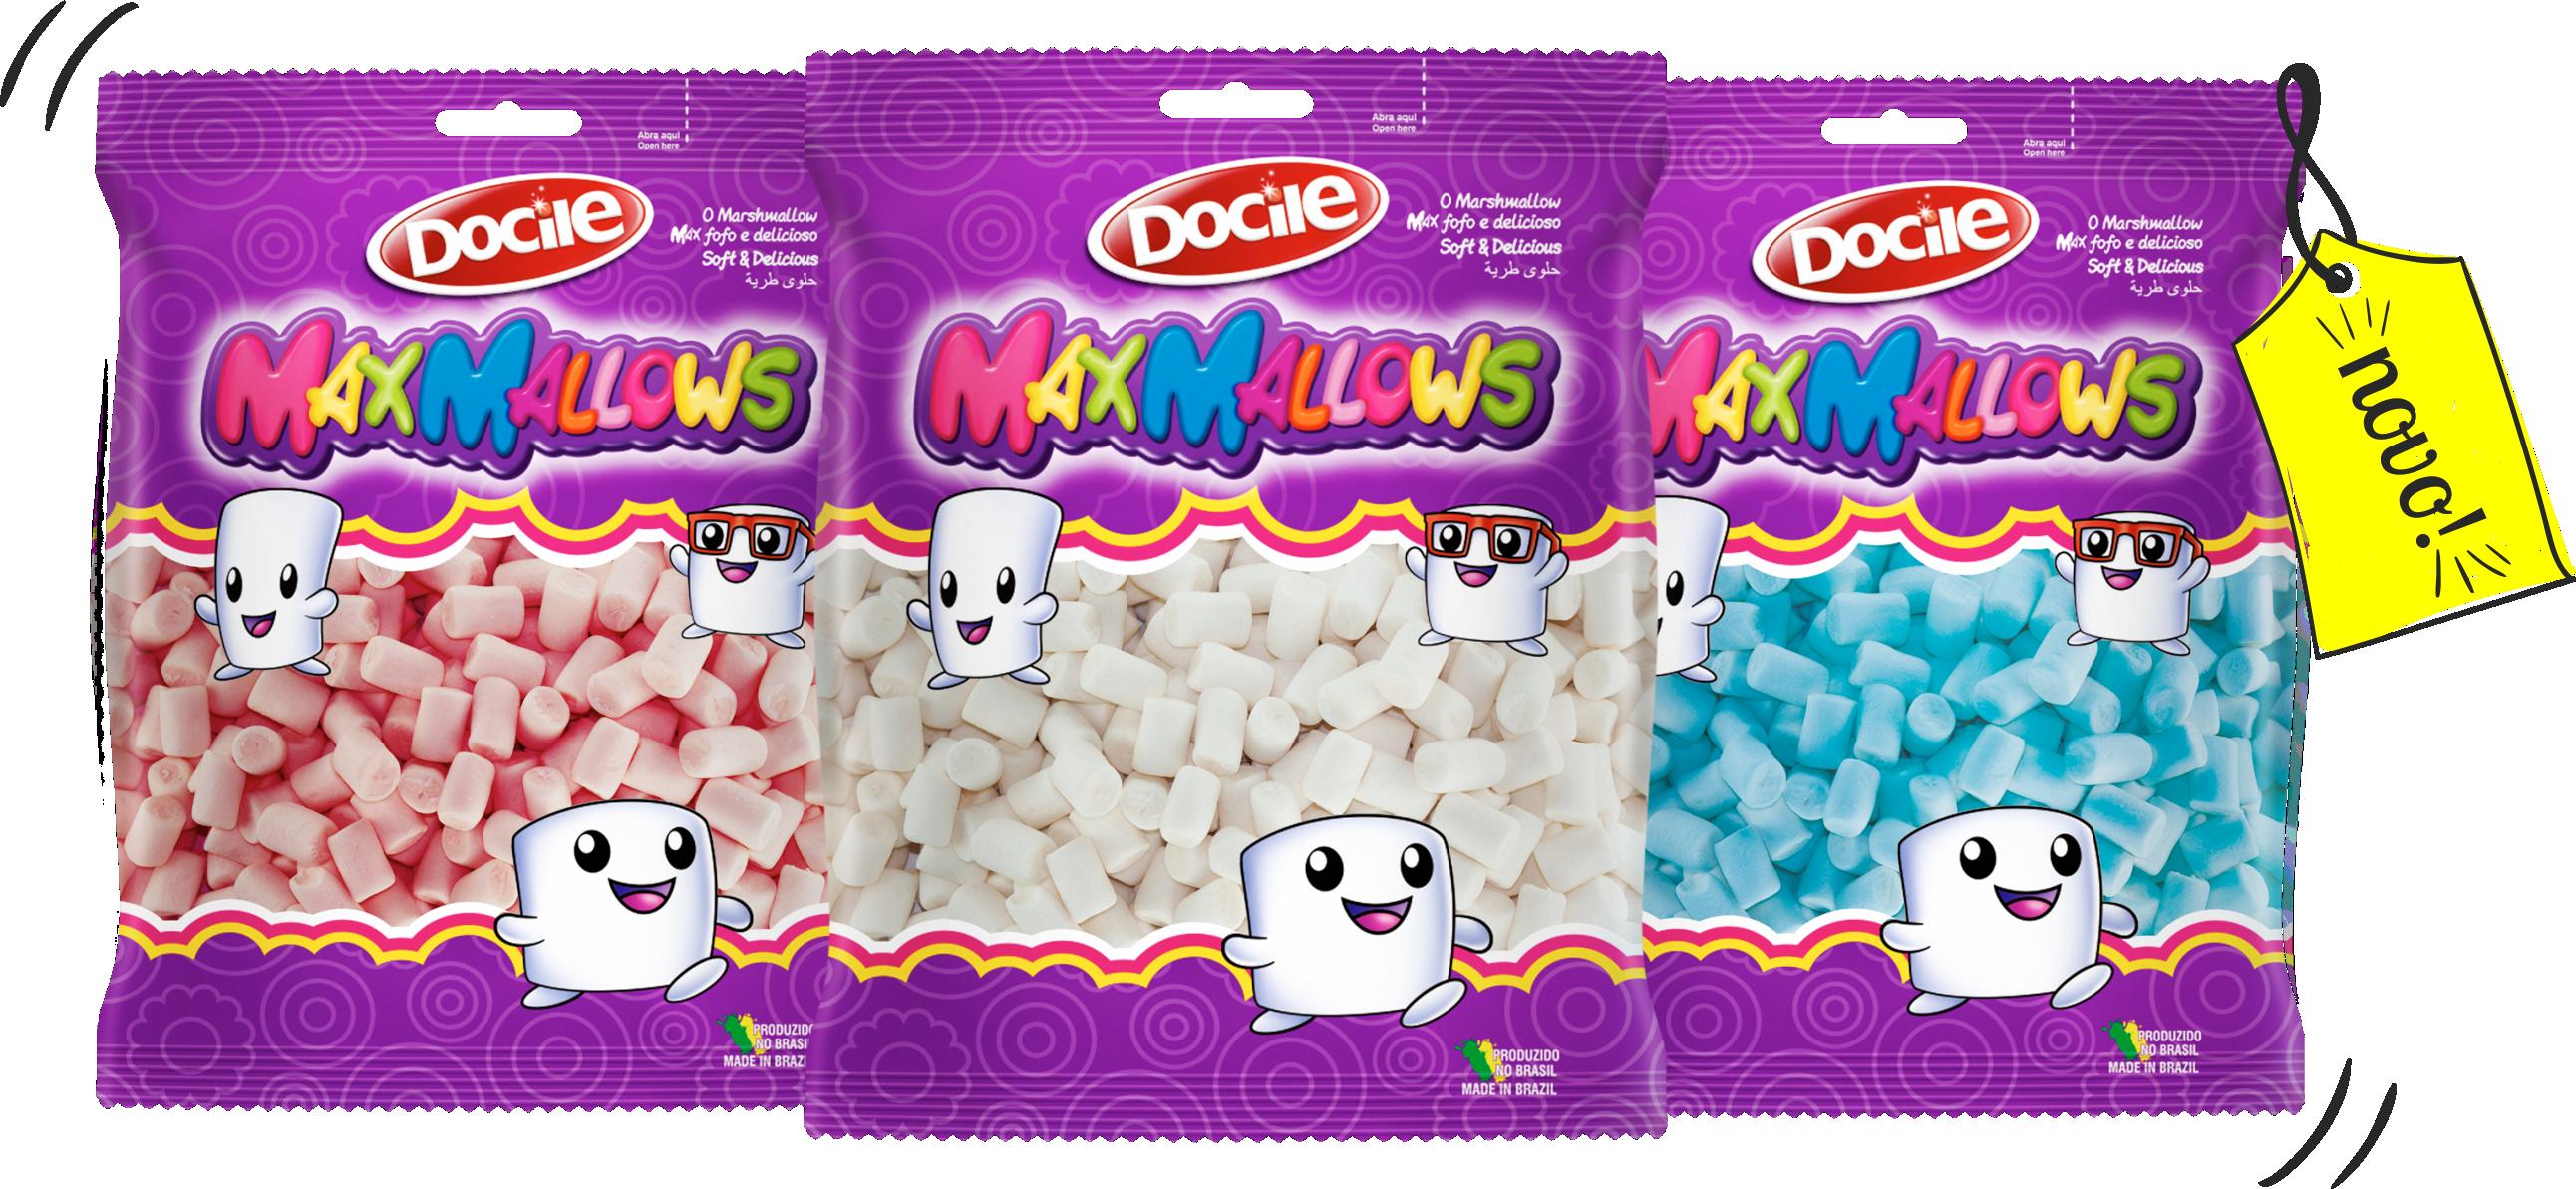 Mini Mas Maxmallows Marshmallow Oferecidos Em Pacotes De 150g Os Esto Disponveis Nas Cores Azul Branco E Rosa